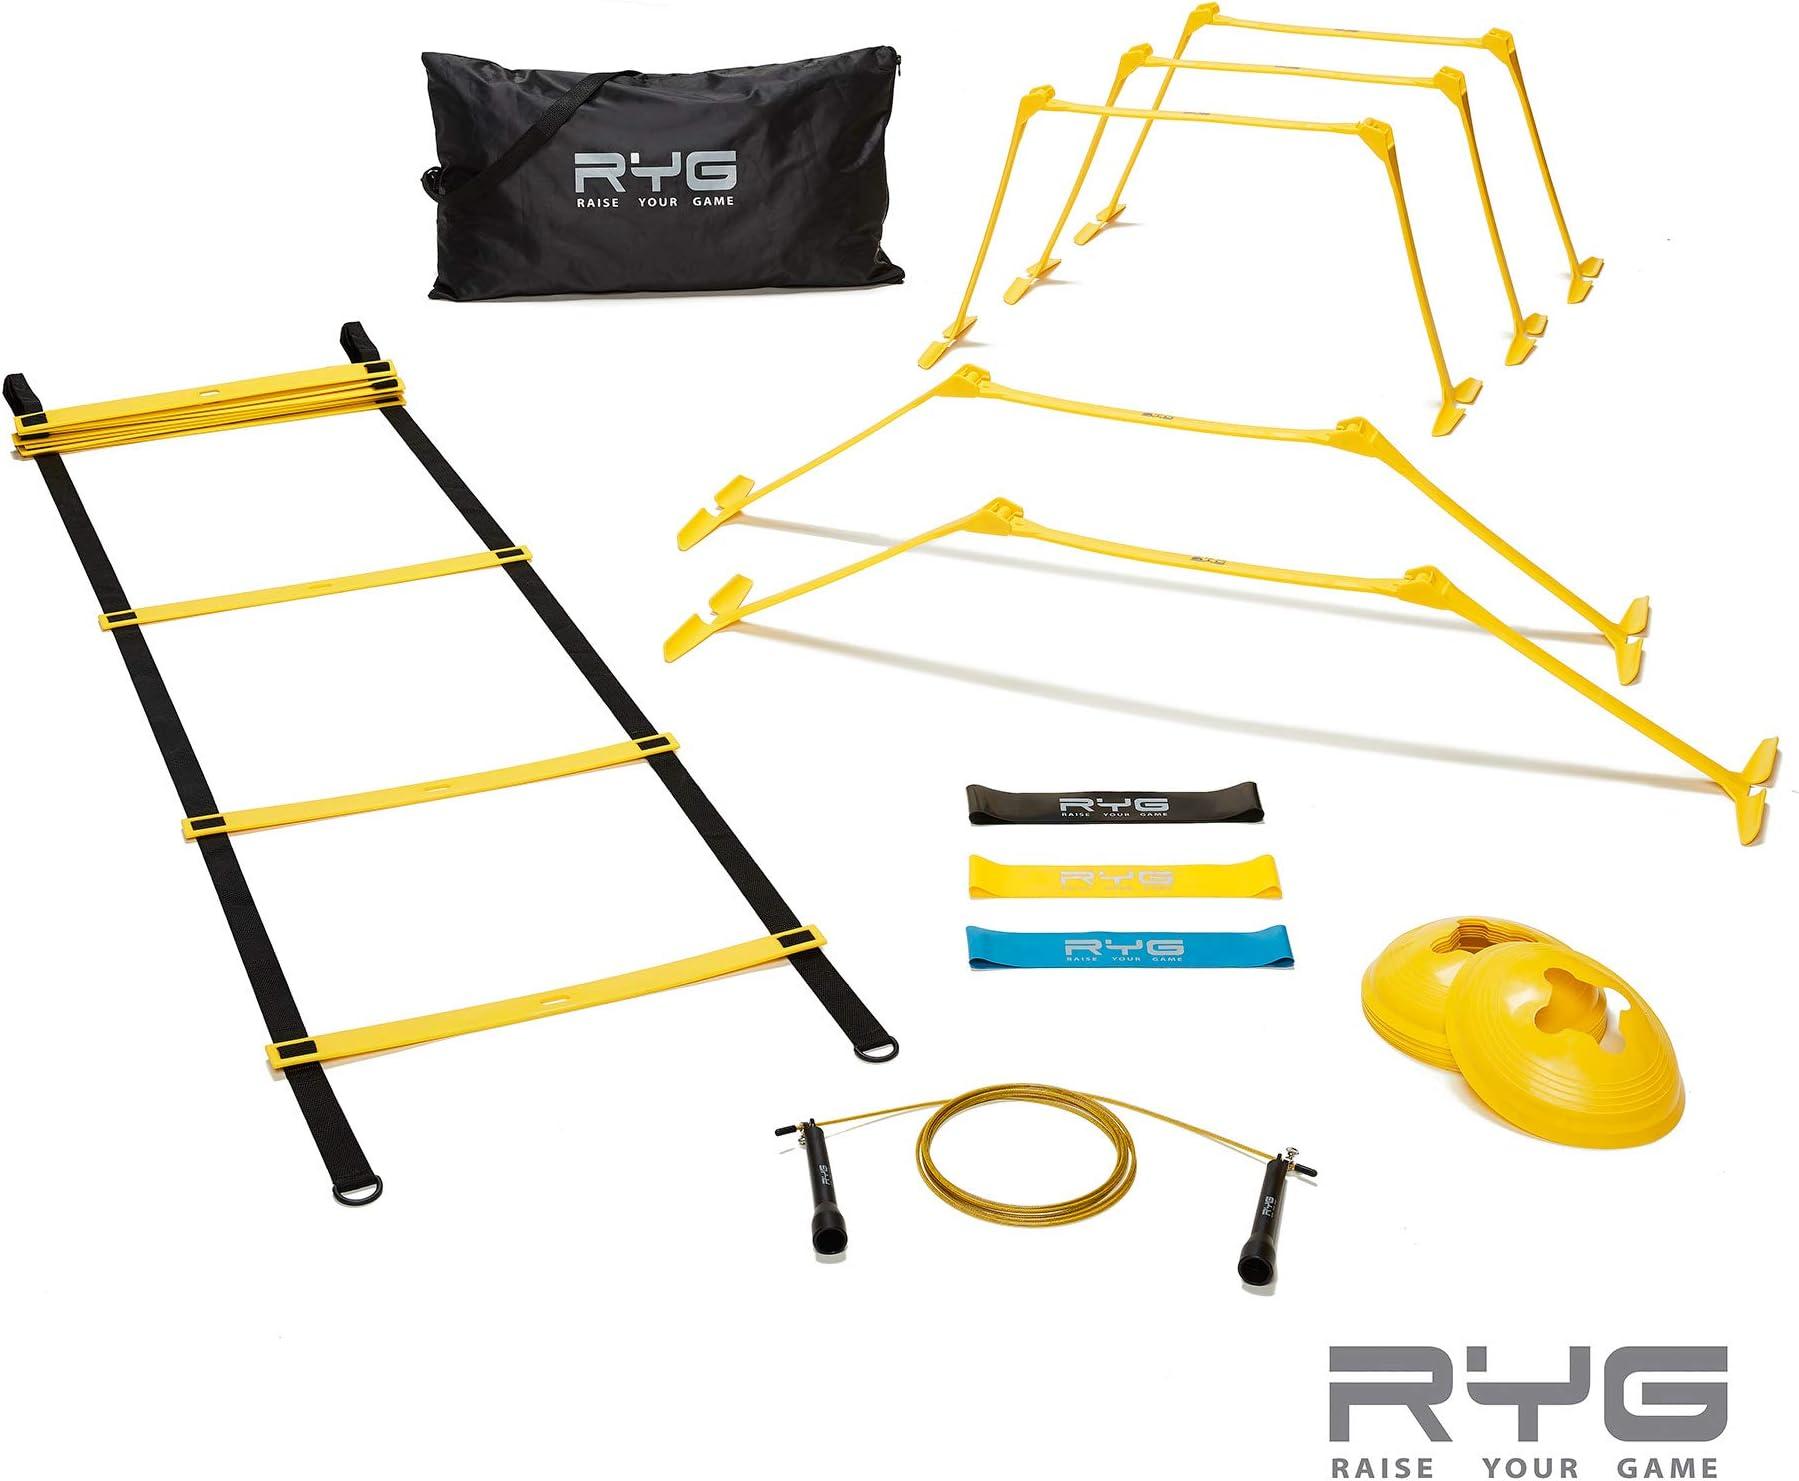 71l zm6WTAL._AC._SR360460 agility ladders amazon com